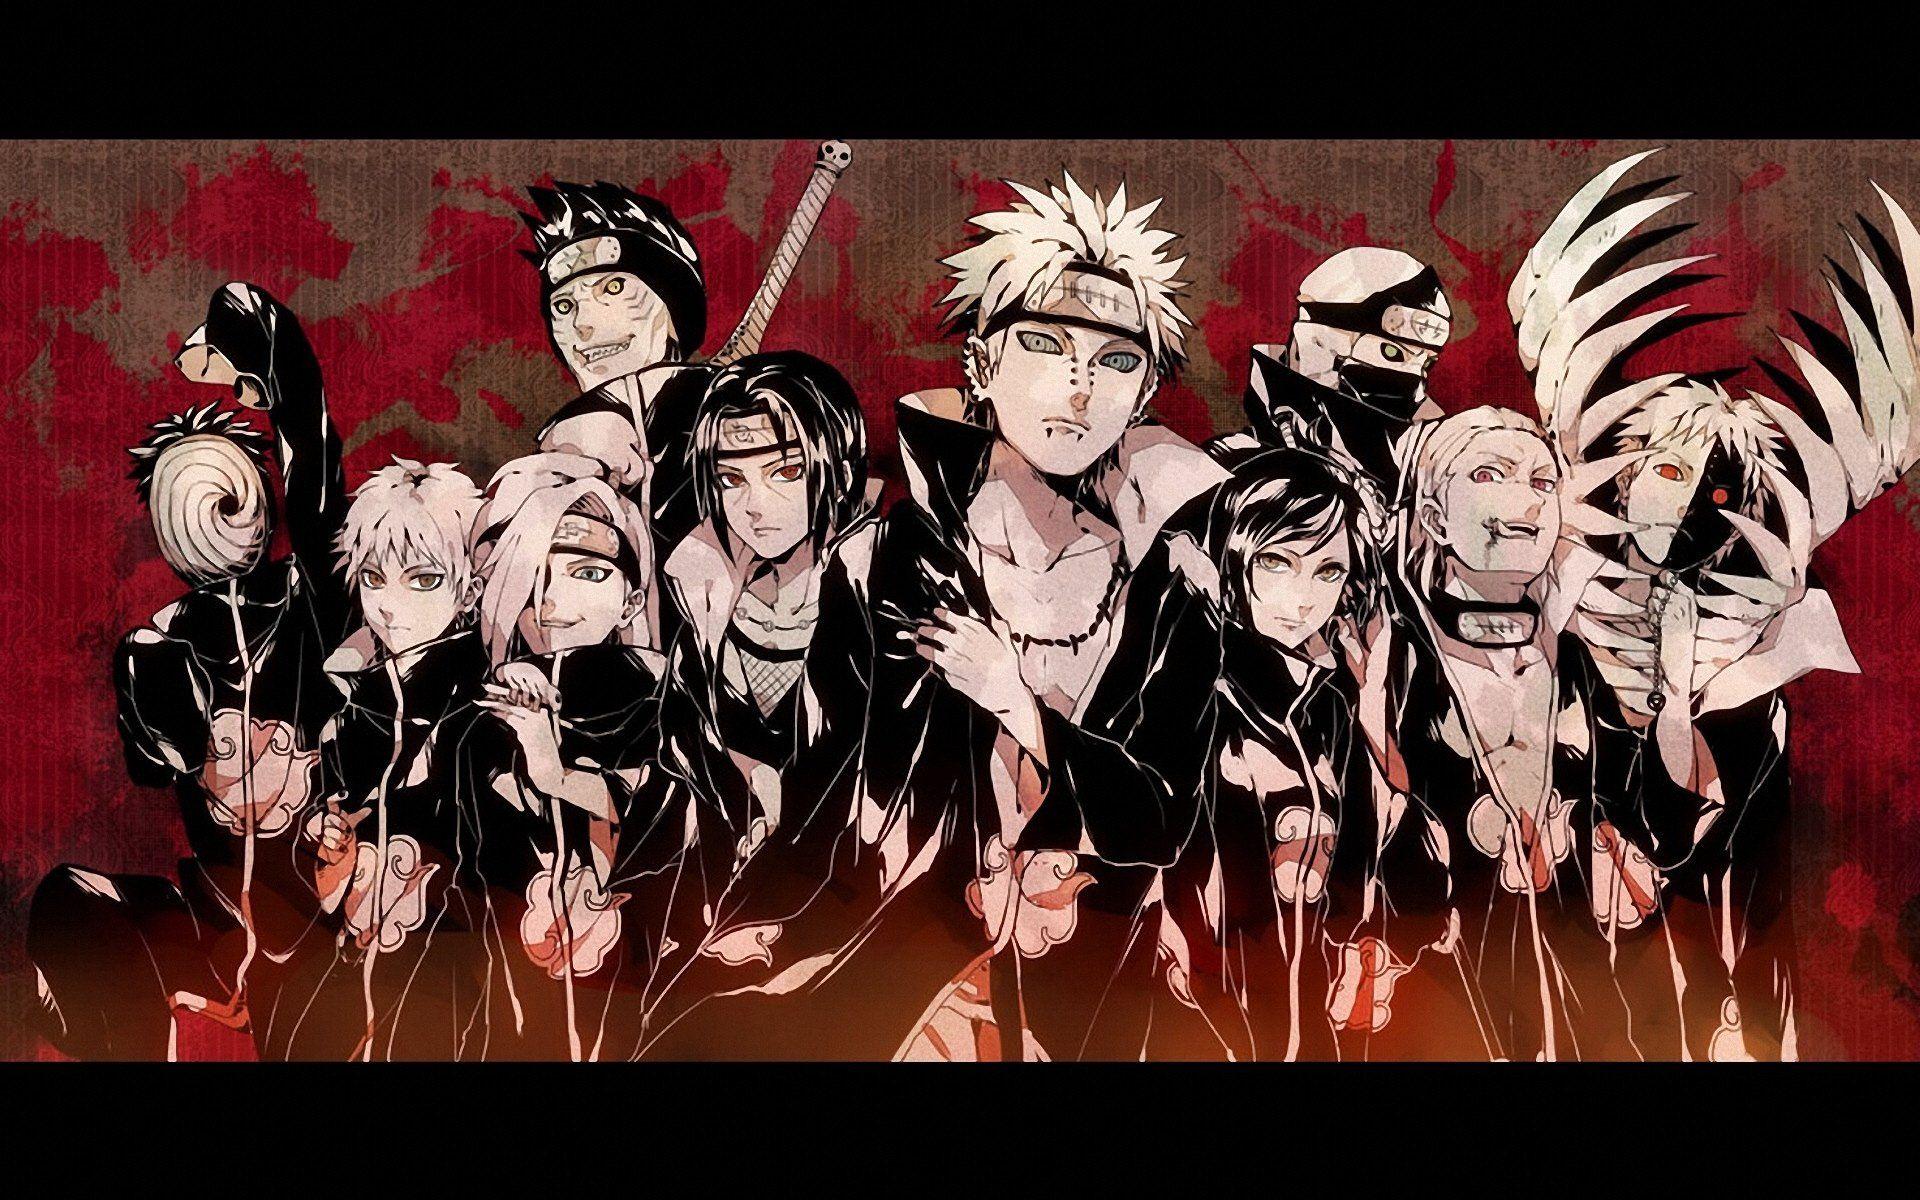 Akatsuki Wallpaper Hd Naruto Wallpaper Best Naruto Wallpapers Anime Wallpaper